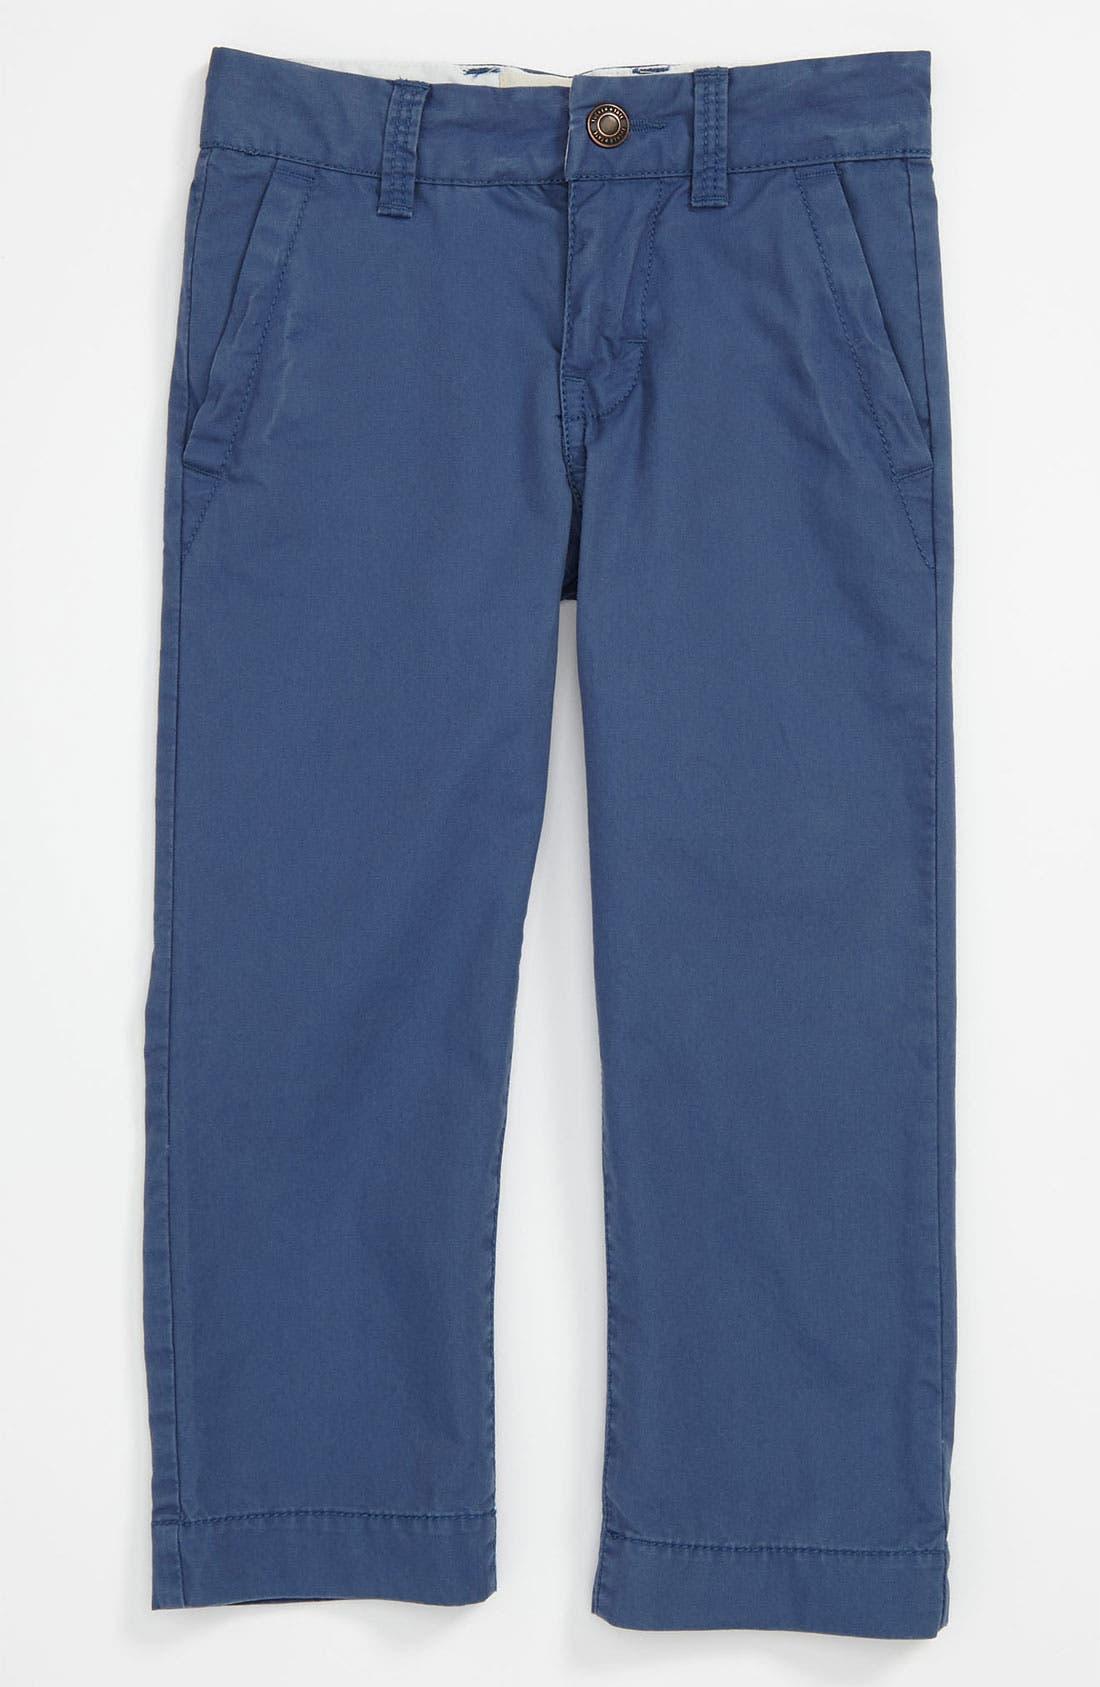 Alternate Image 1 Selected - Tucker + Tate 'Scott' Chino Pants (Toddler)